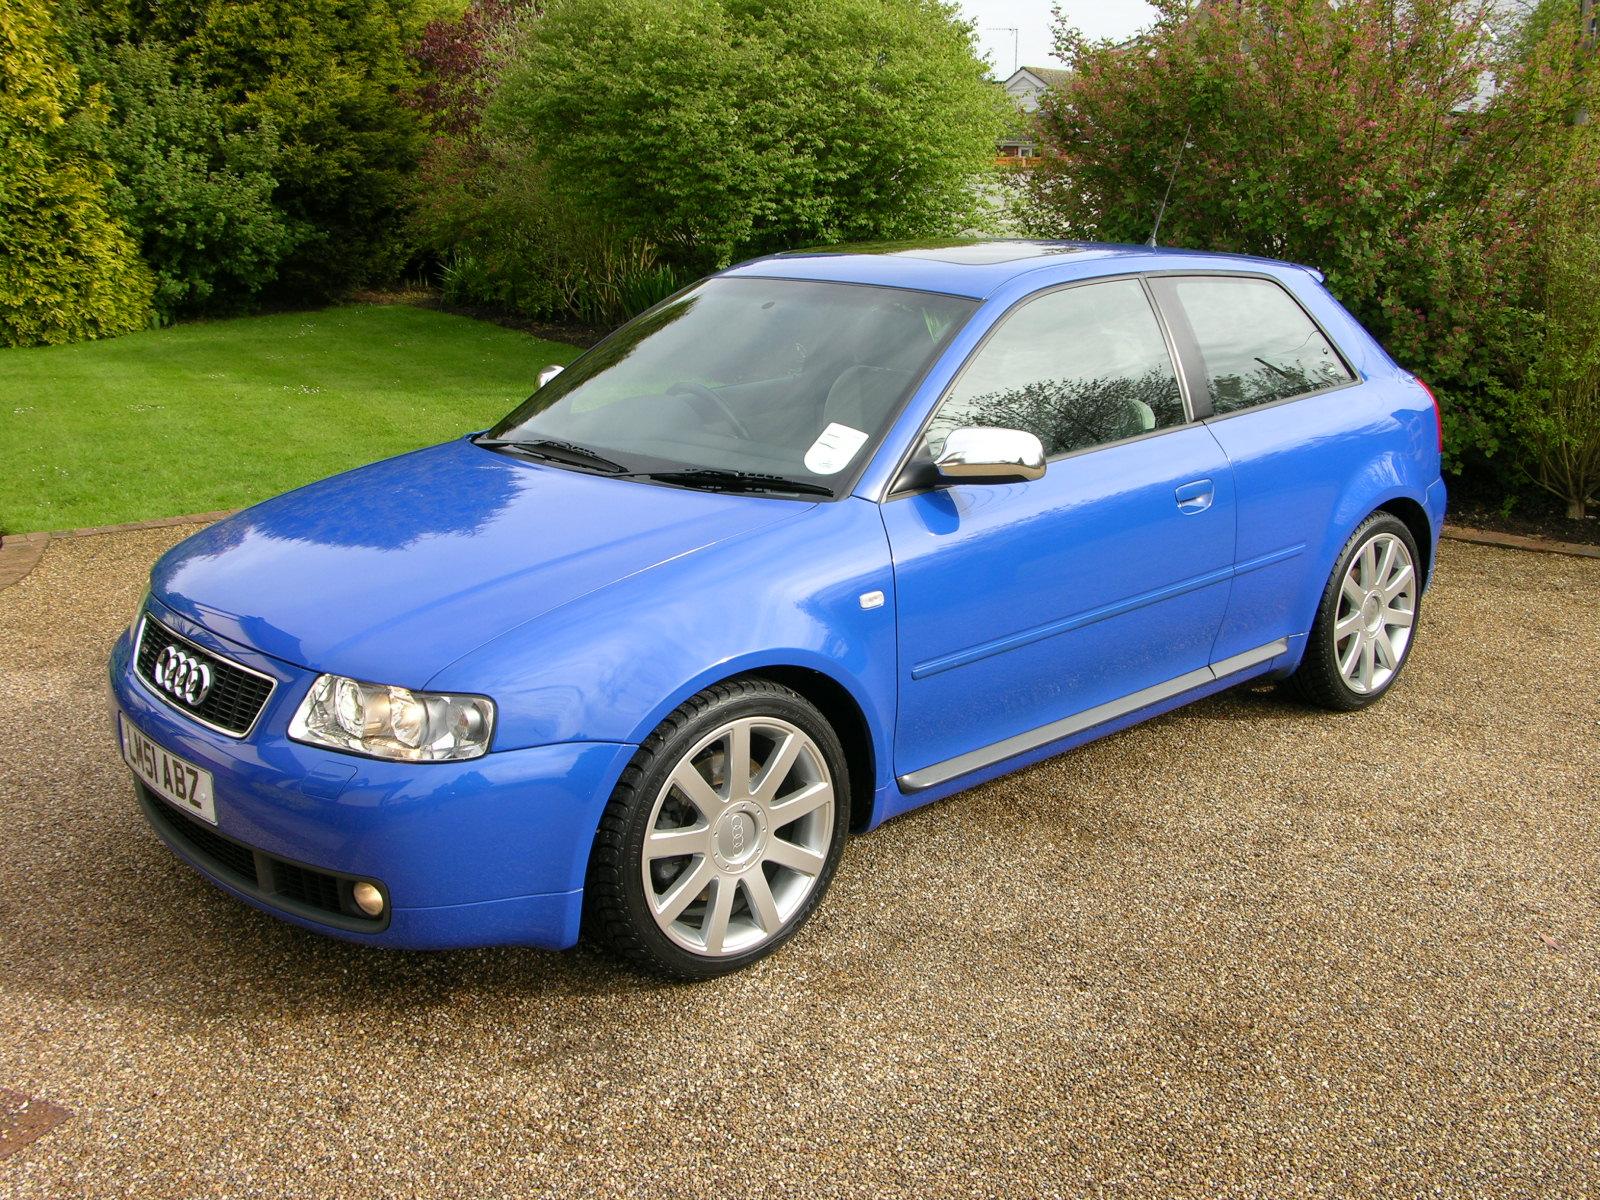 File Audi S3 Nogaro Blue 2001 Flickr The Car Spy 12